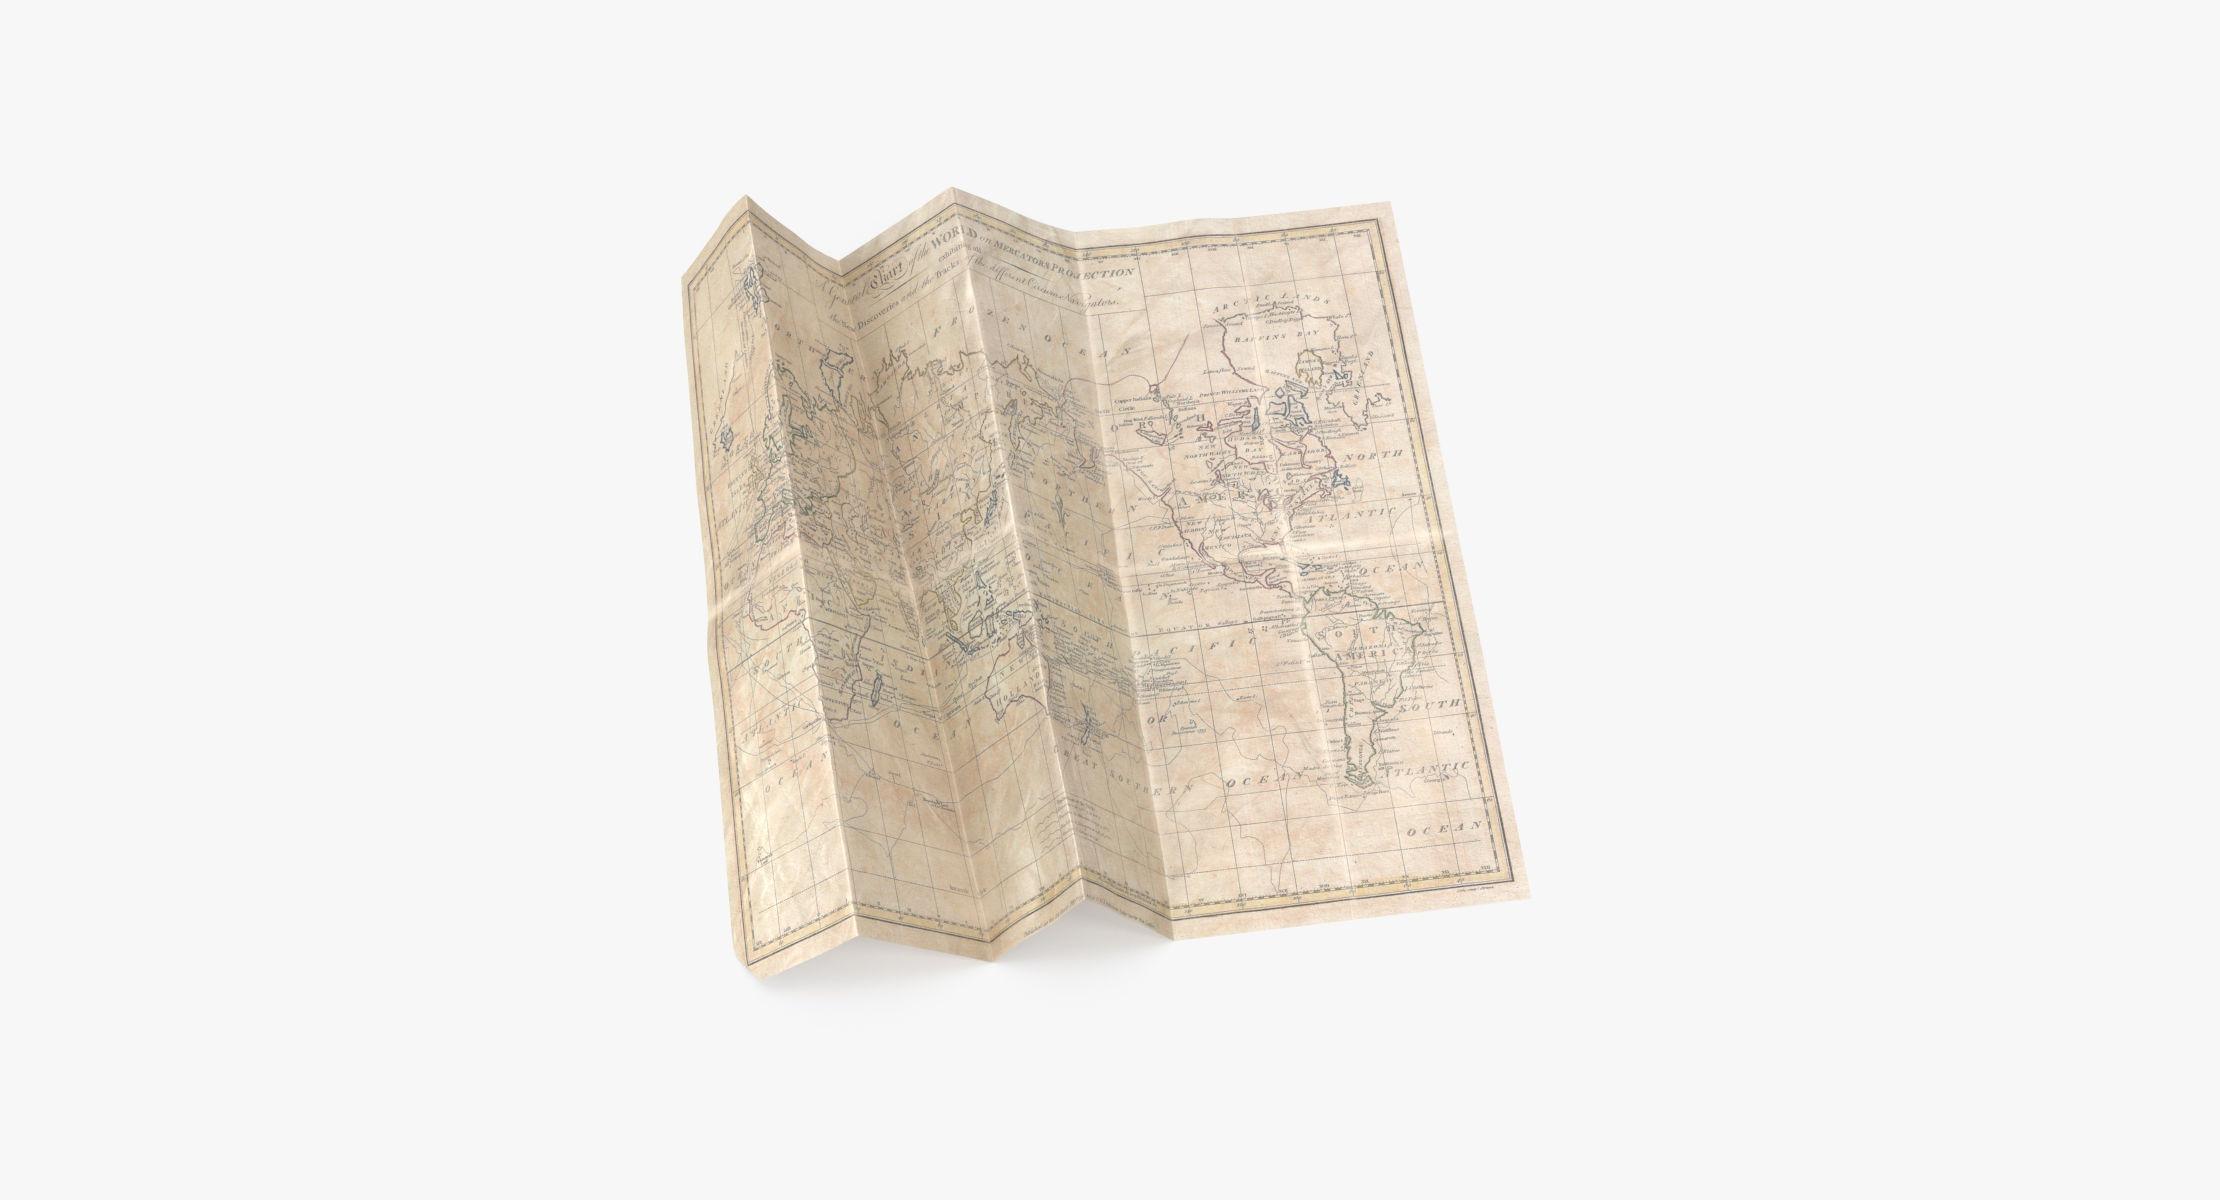 Retro Map 01 02 - reel 1